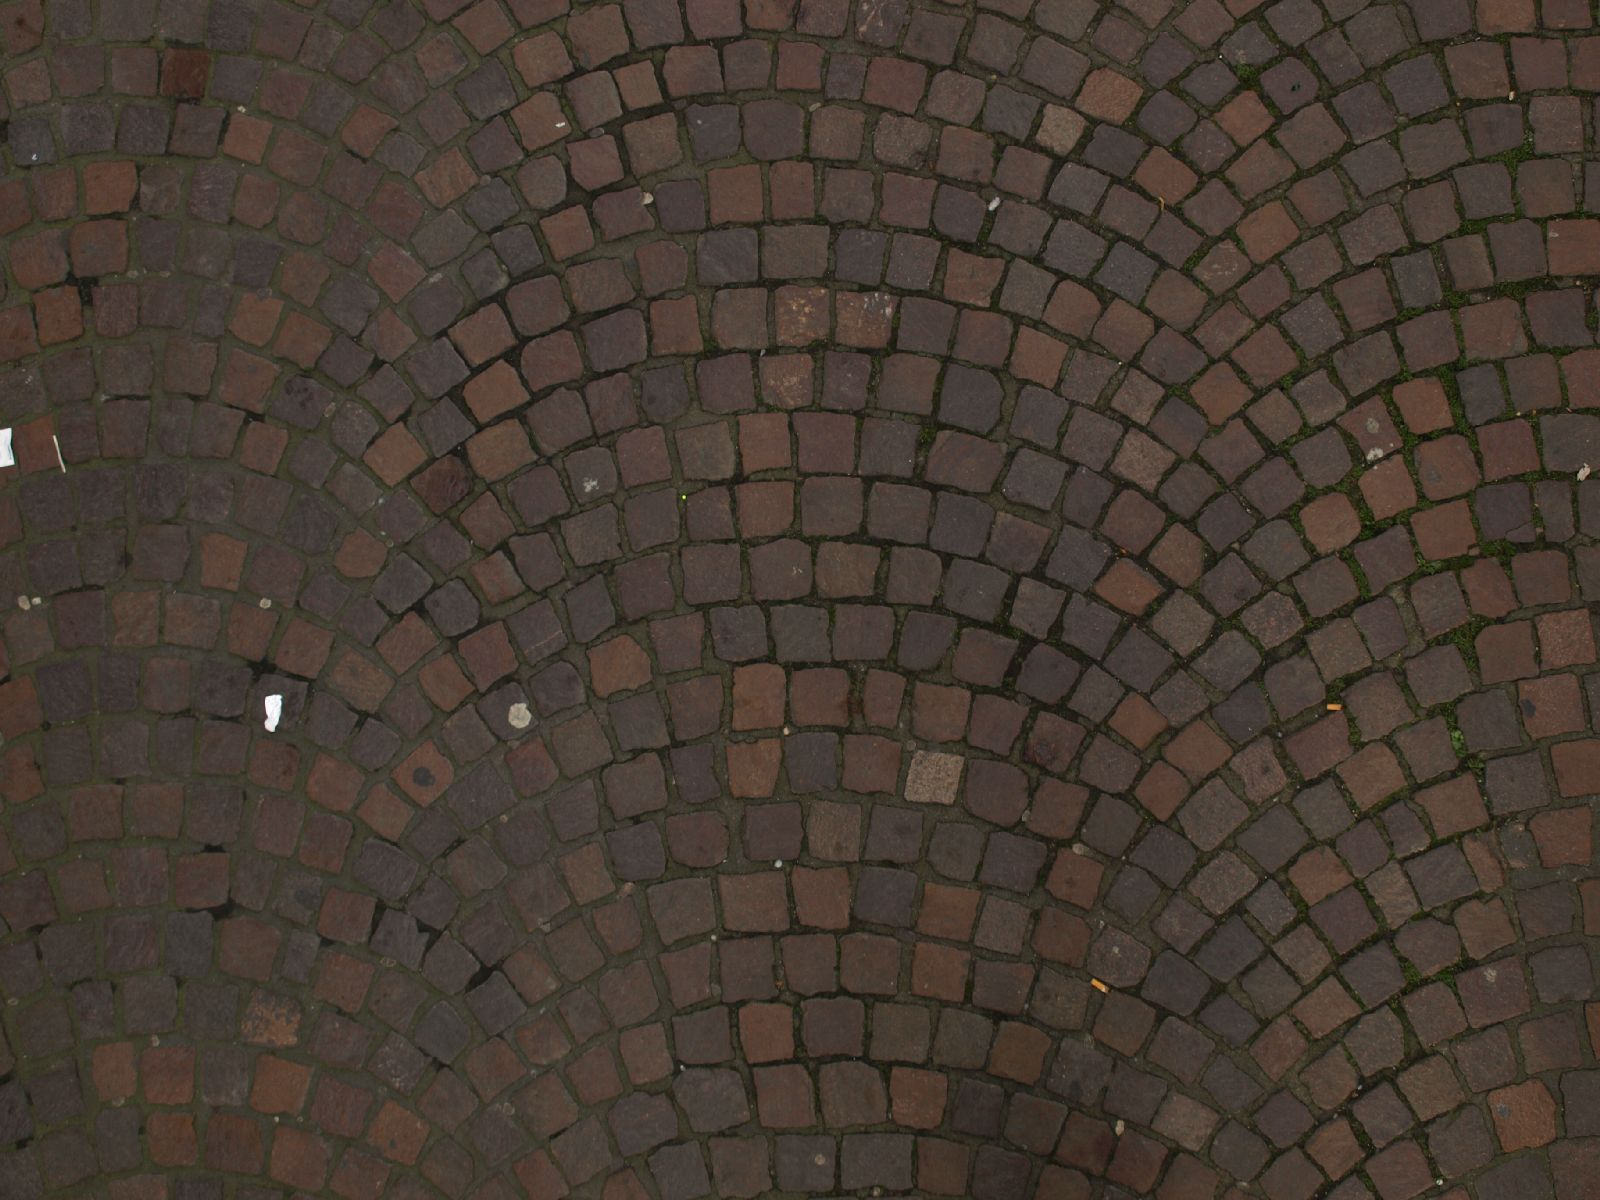 Ground-Urban_Texture_A_PB010920